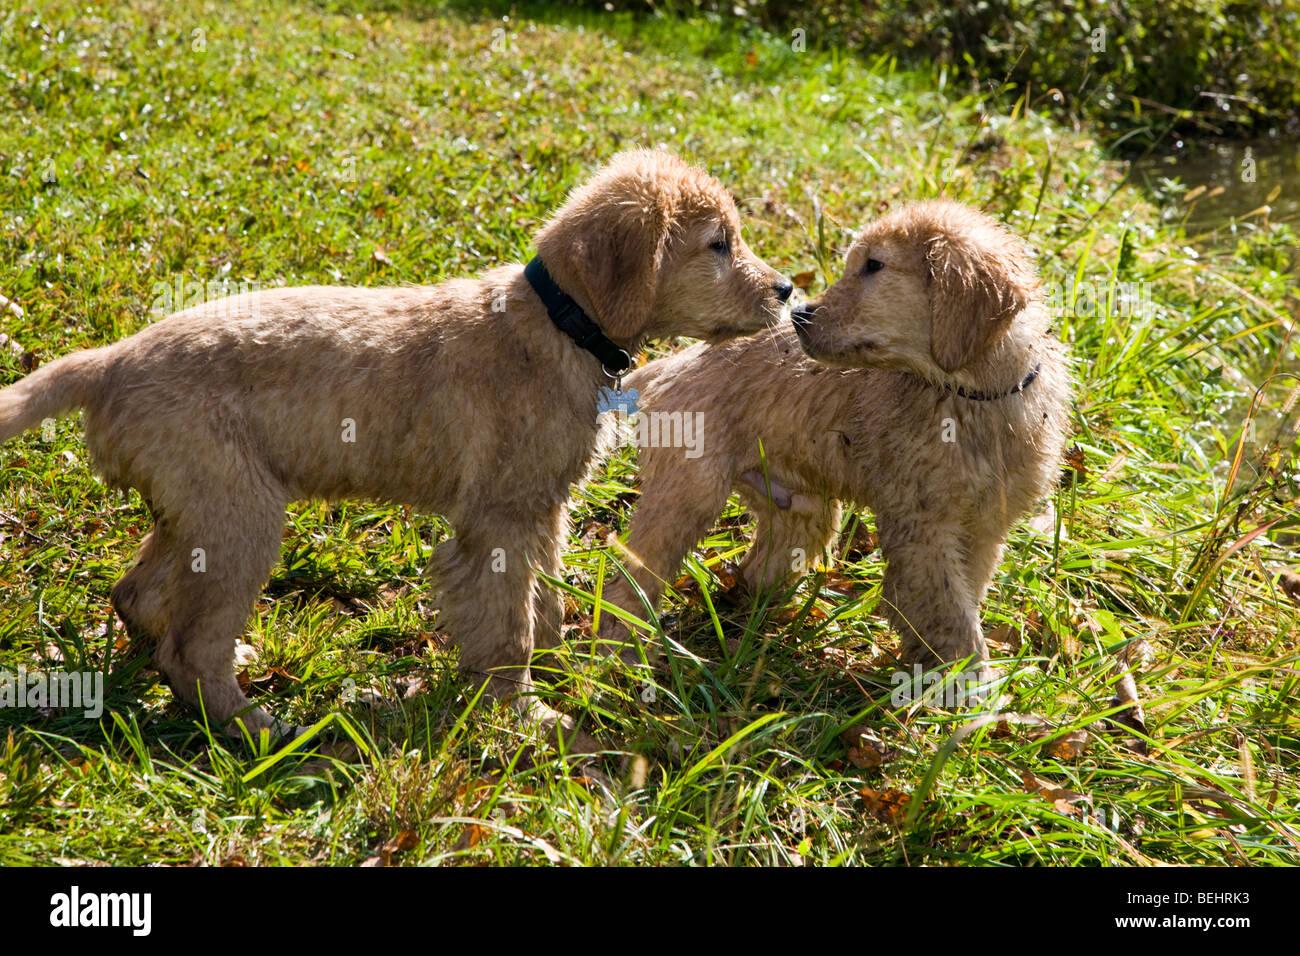 Two Wet Twelve Week Old Golden Retriever Puppies Play After A Swim